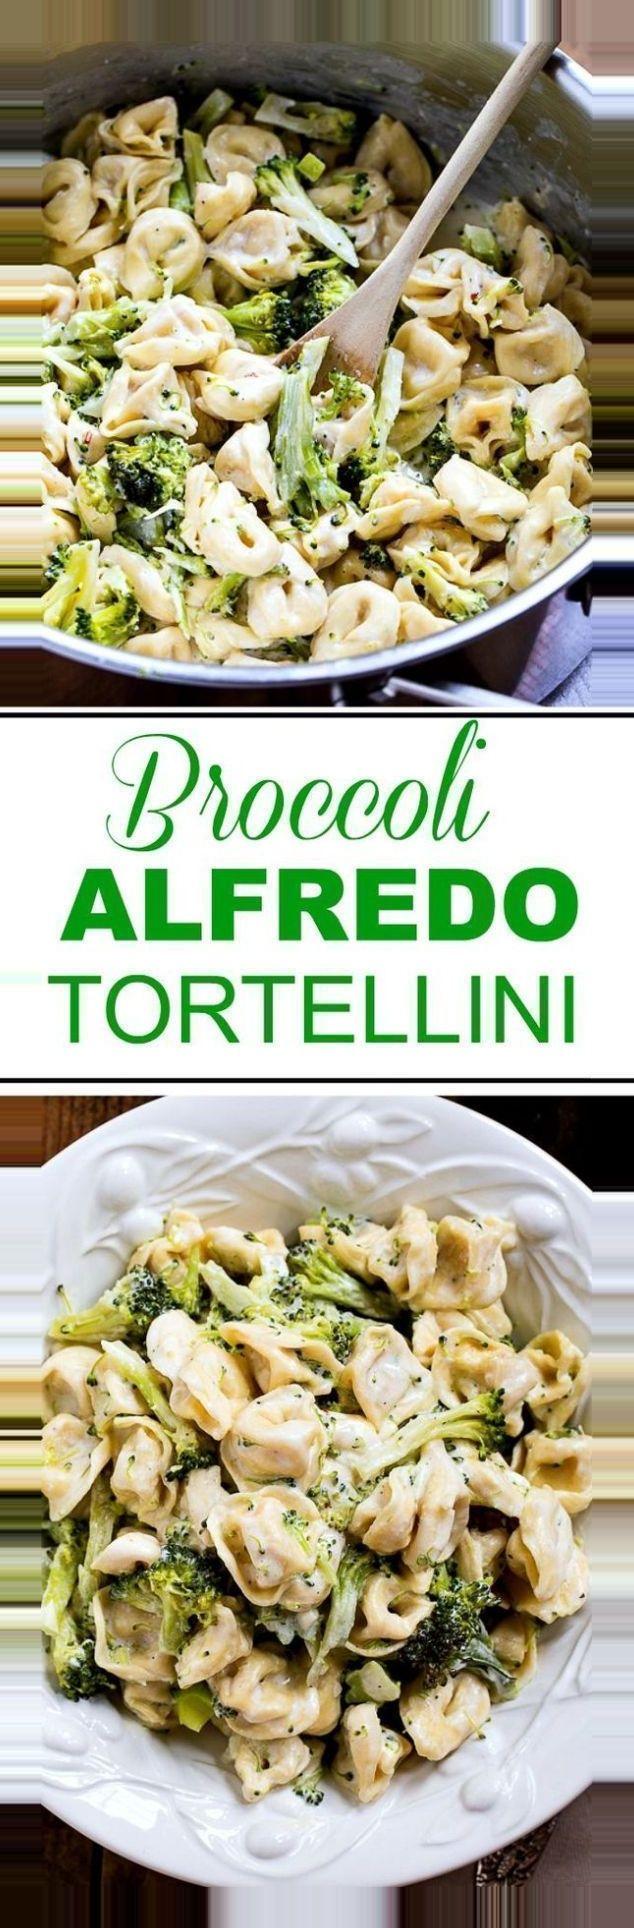 , #alfredo #broccoli #Reisepaarziele #tortellini Broccoli Alfredo Tortellini Broccoli Alfredo Tortellini 30 Minute Meal Recipe via Spicy Southern Kitche…, Travel Couple, Travel Couple